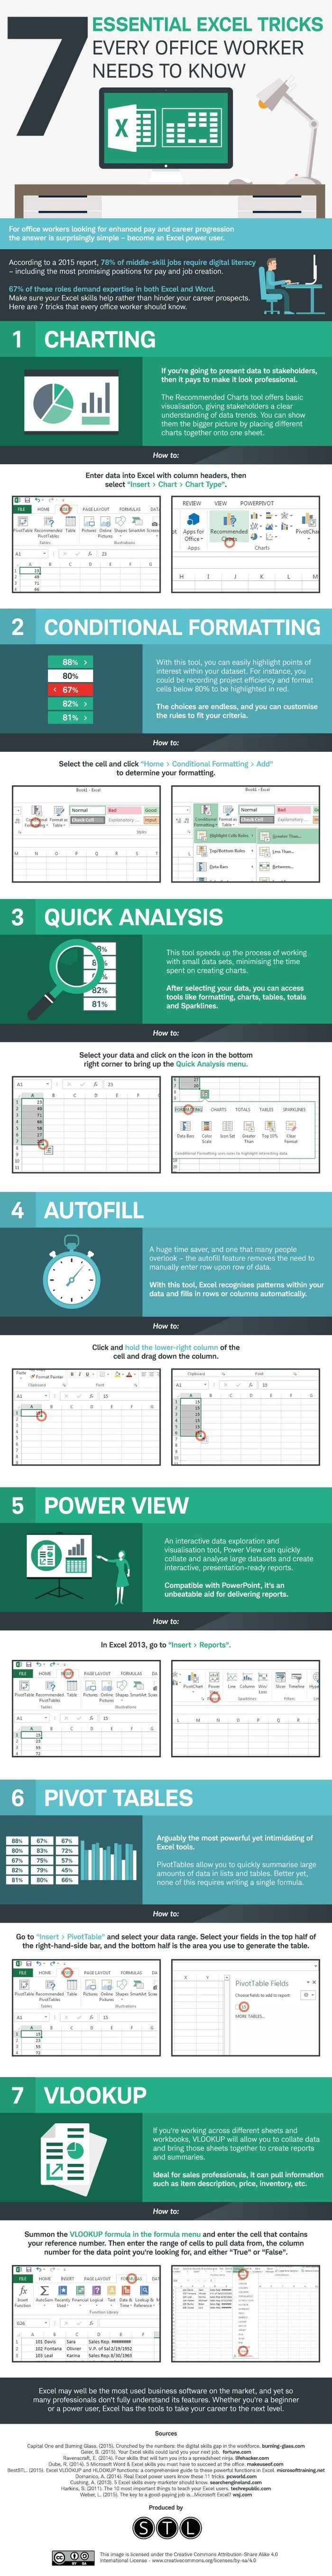 Excel Basics: Tricks Every Office Worker Needs to Know [Infographic] - https://technnerd.com/excel-basics-tricks-every-office-worker-needs-to-know-infographic/?utm_source=PN&utm_medium=Tech+Nerd+Pinterest&utm_campaign=Social